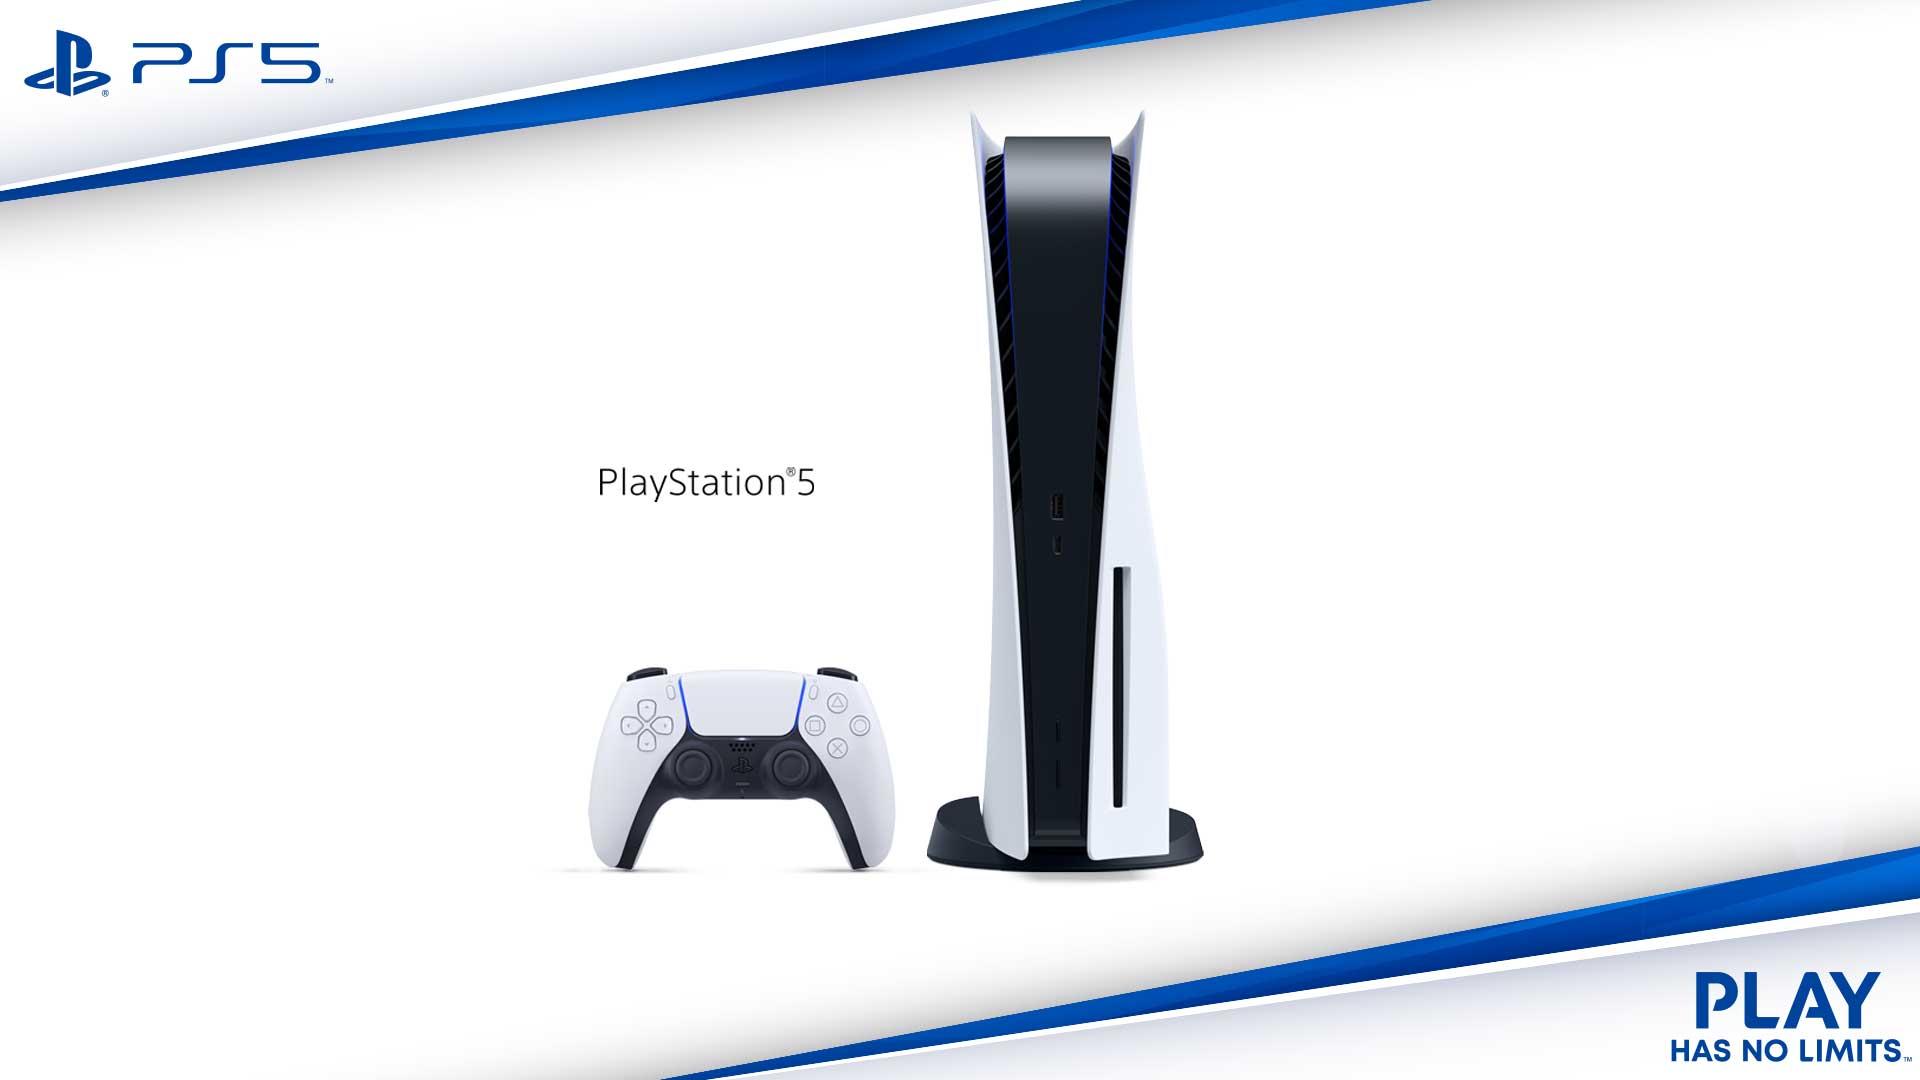 FYI - PS5 - GameStop preorders starting tomorrow